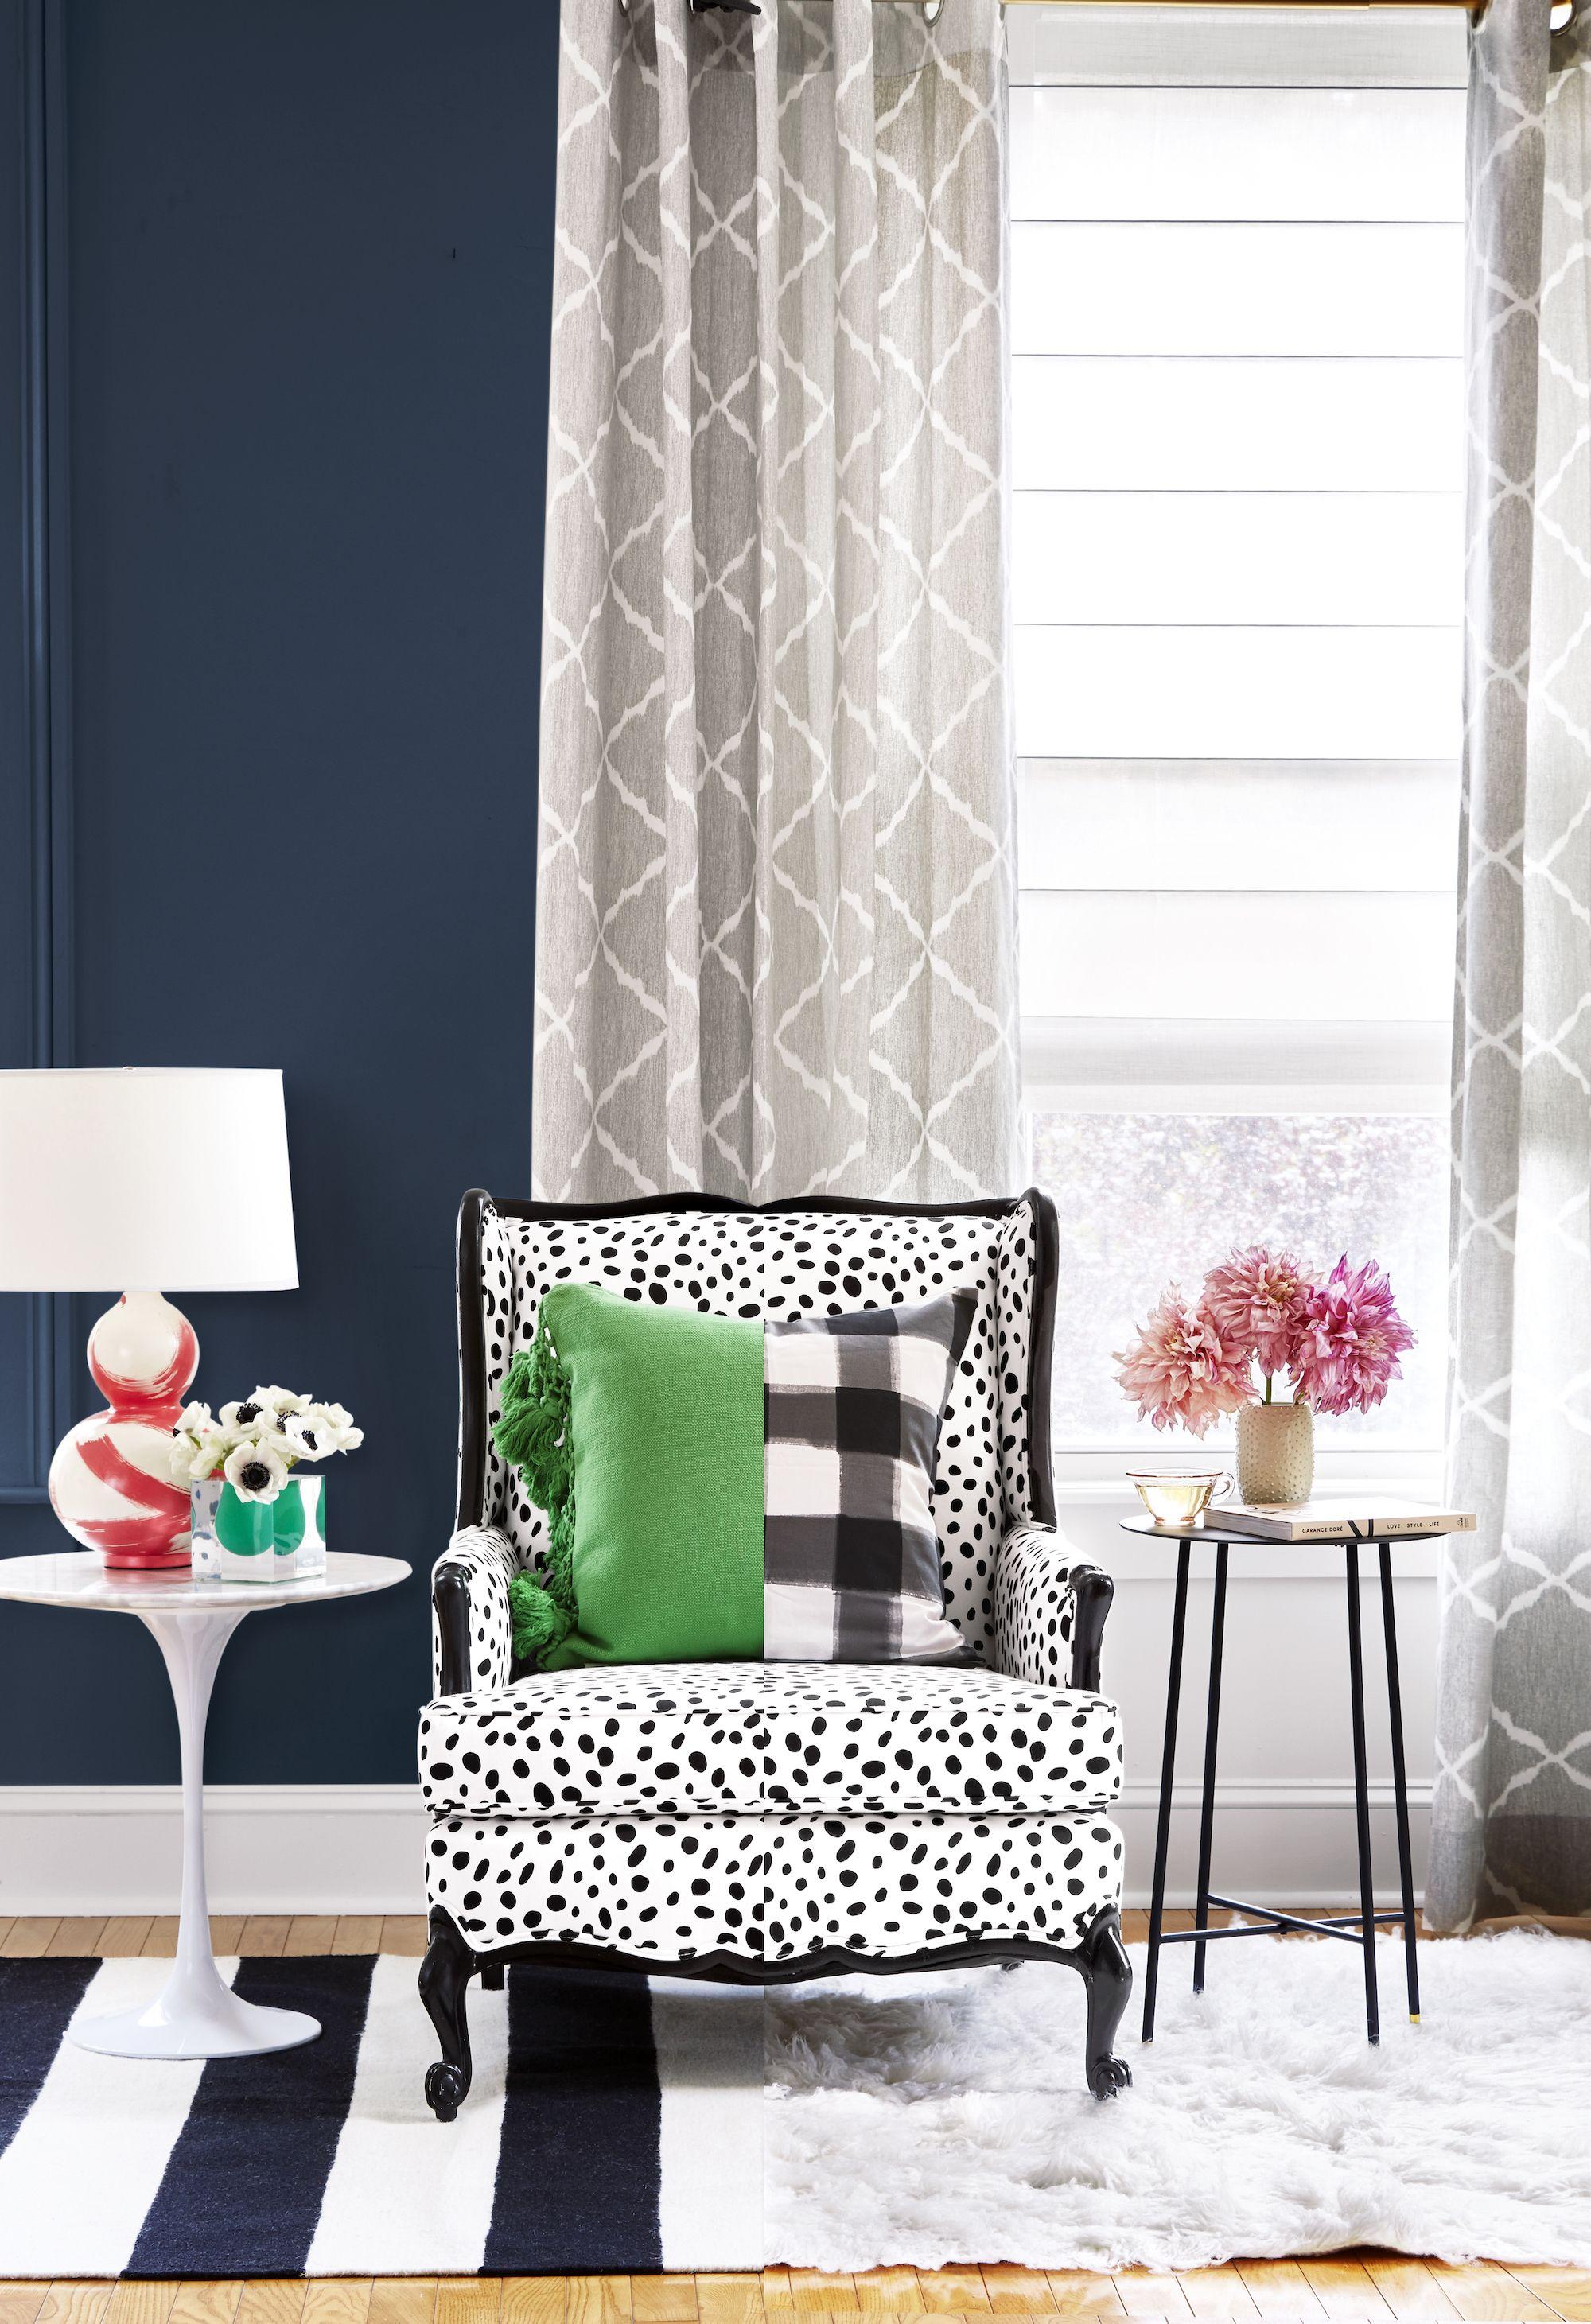 Marvelous 15 Upcycled Furniture Ideas Repurposed Furniture Before Uwap Interior Chair Design Uwaporg